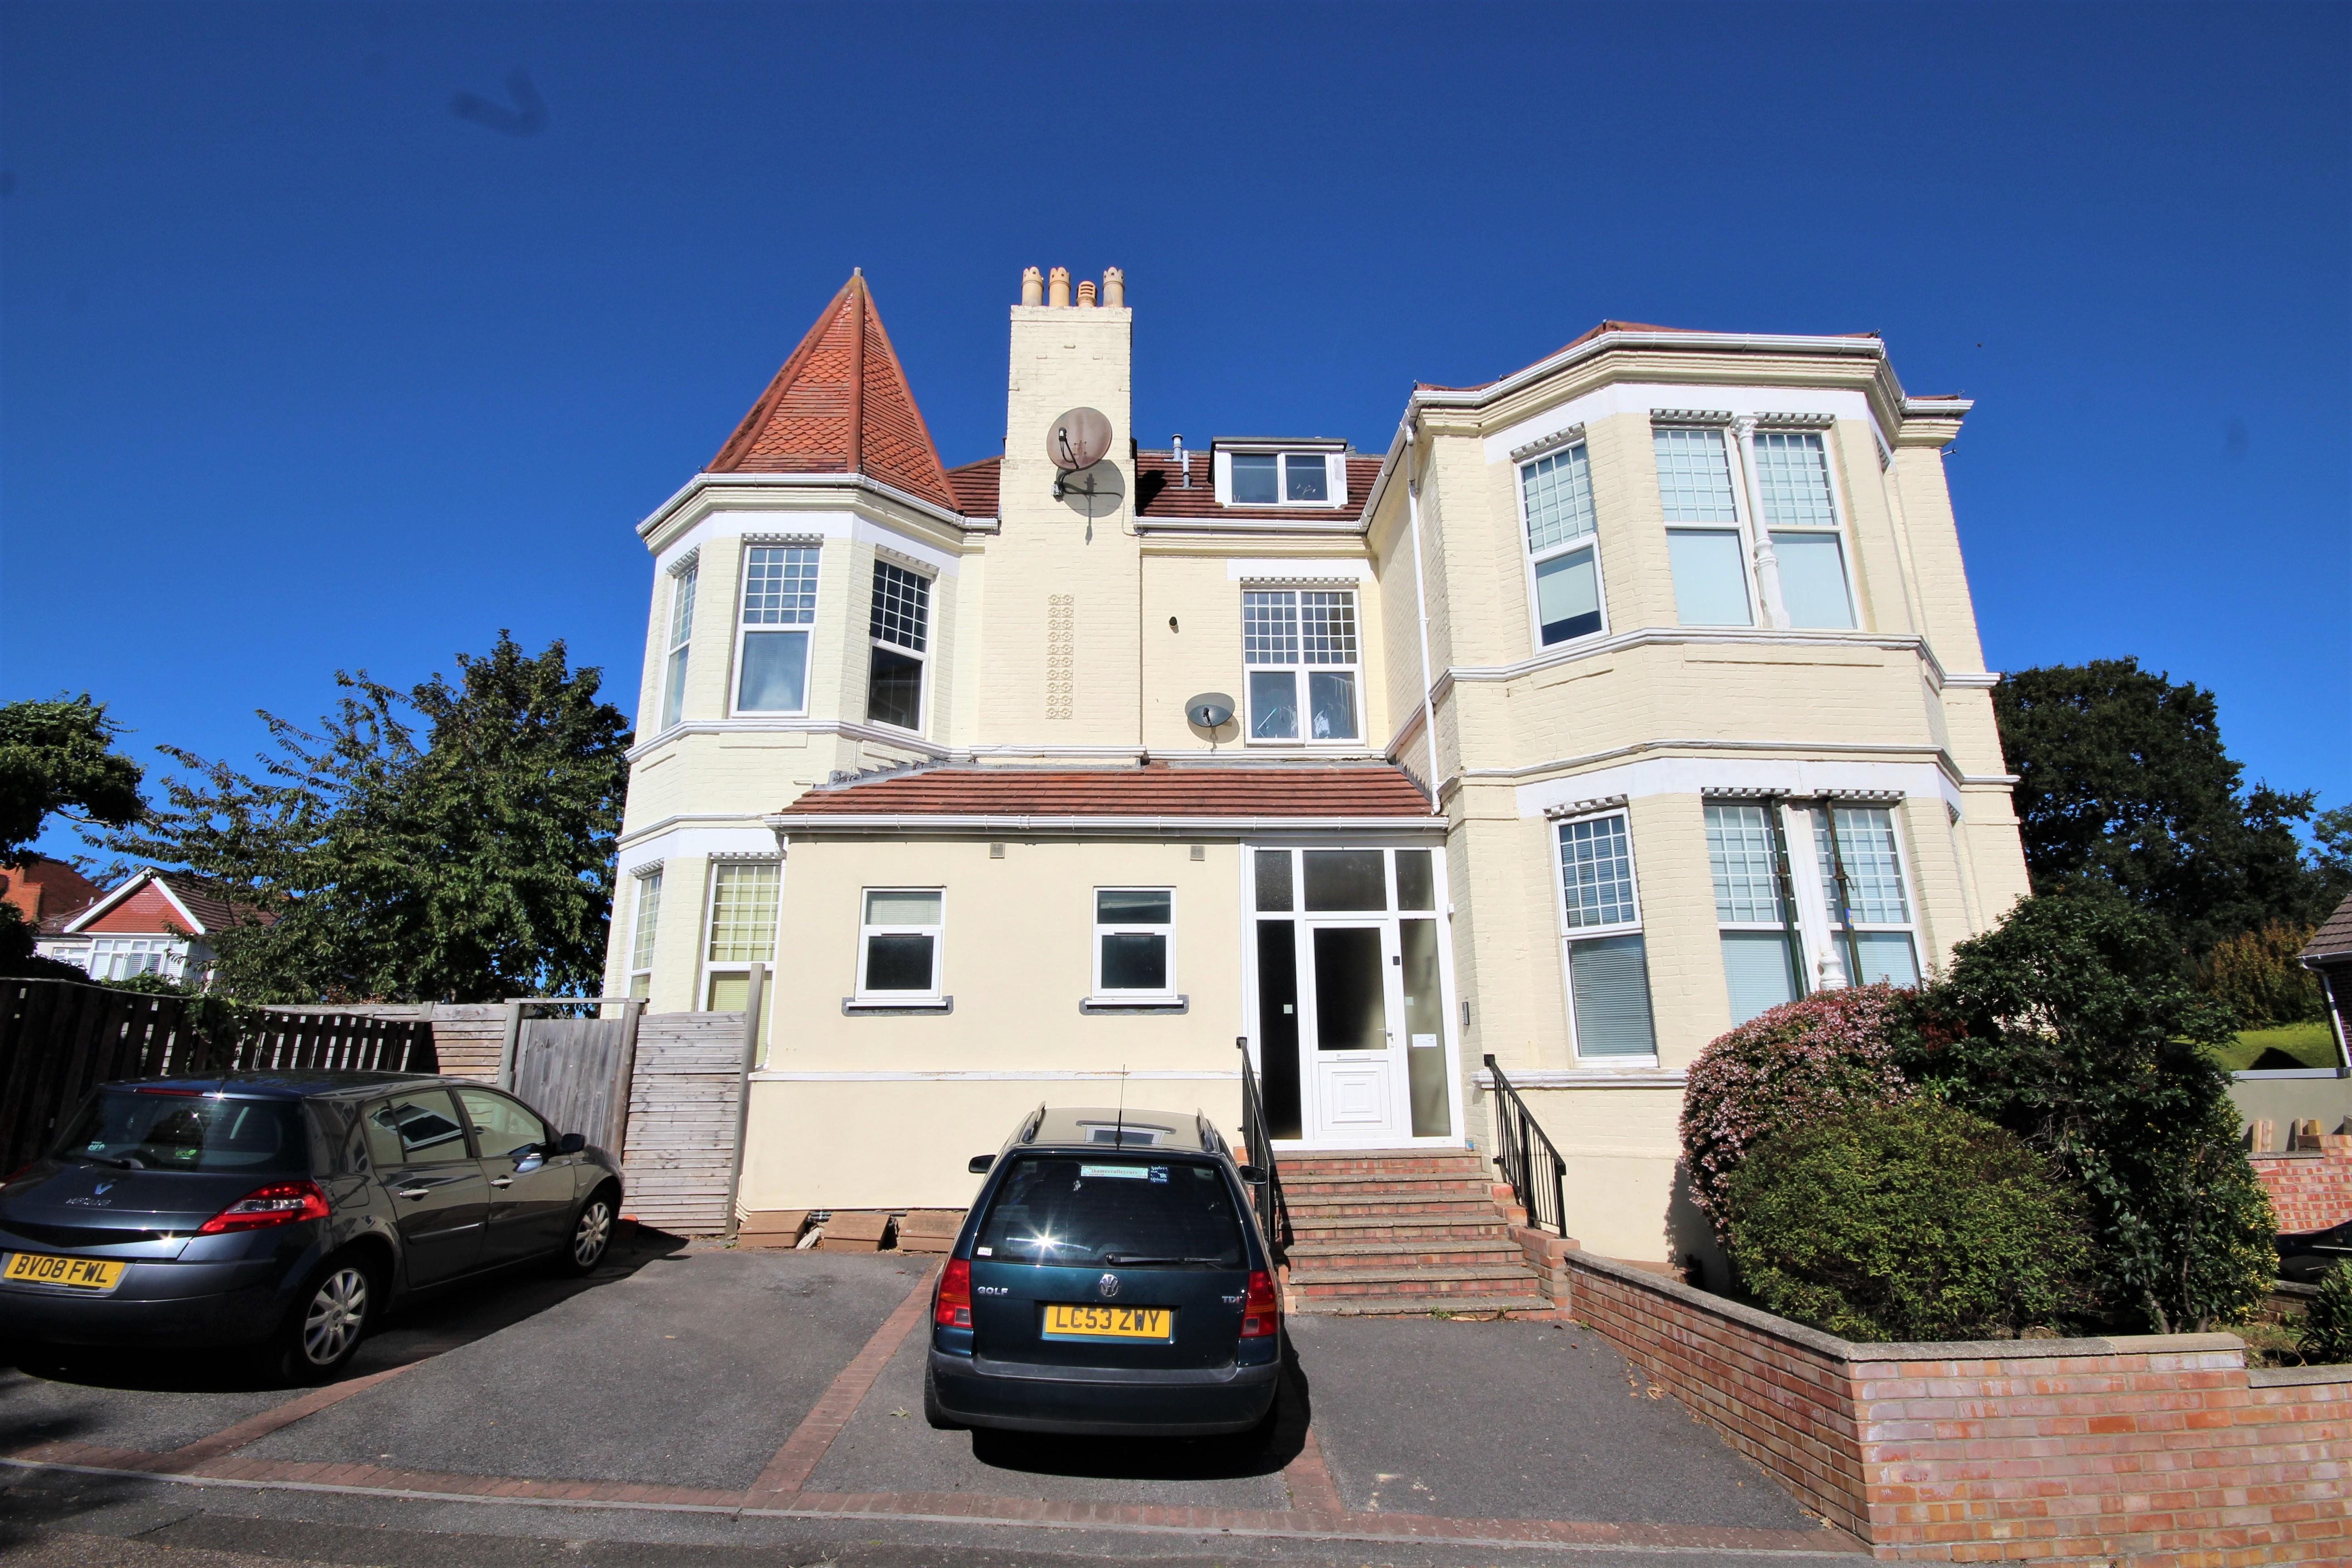 Bournemouth, BH6